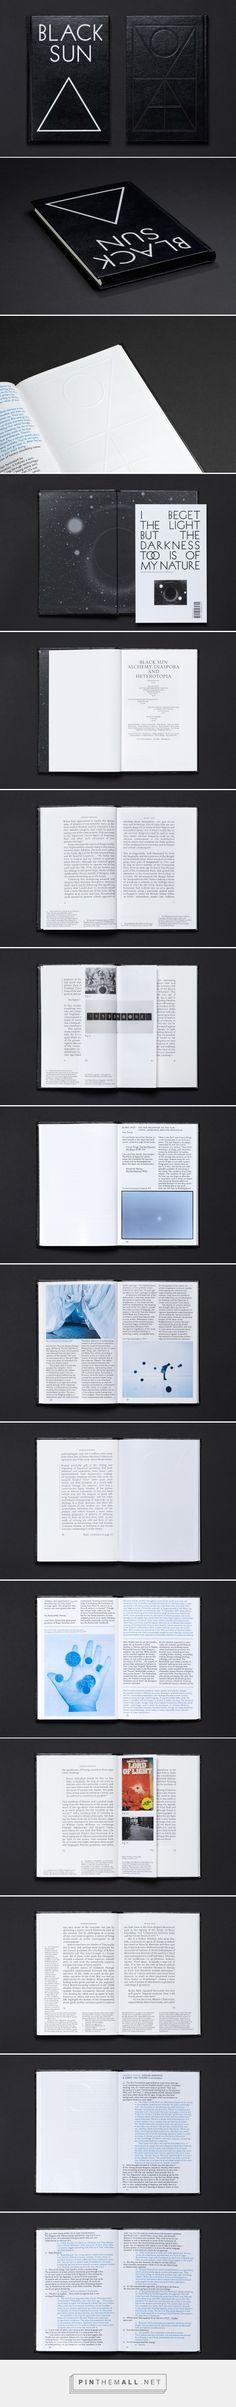 *art & science* - Black Sun - livre d'exposition - OK-RM (Royaume-Uni)